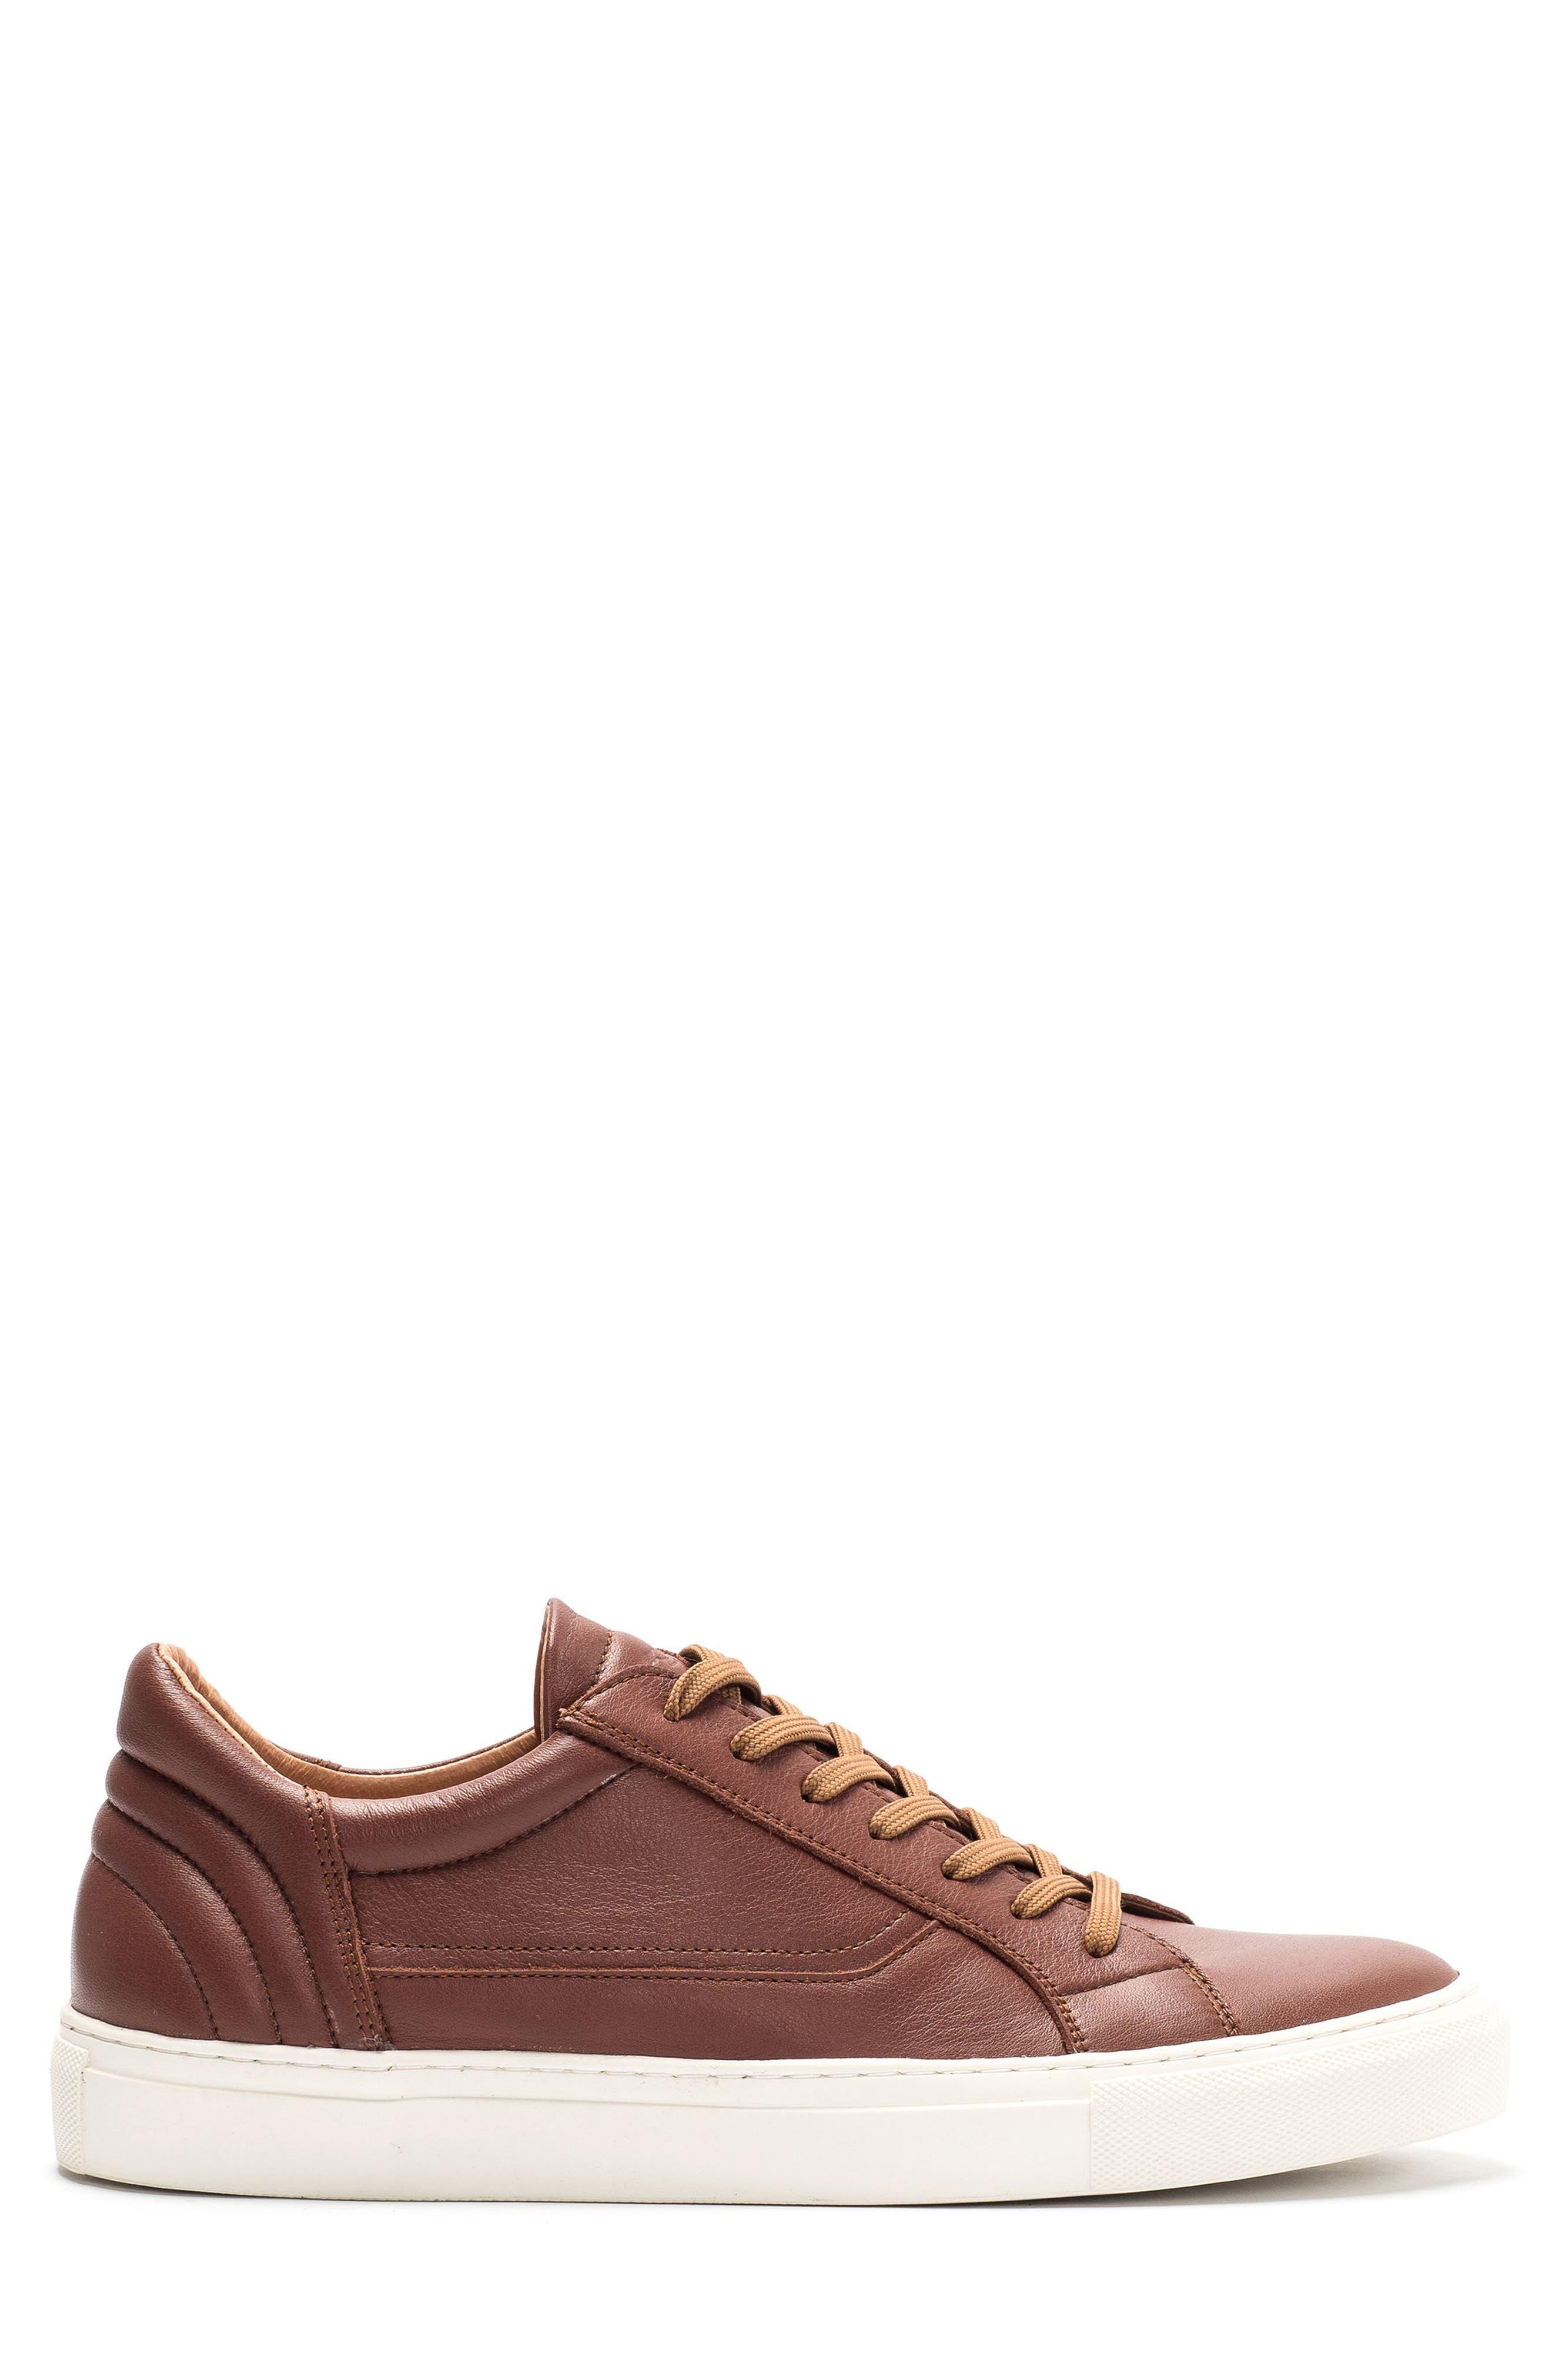 Shelton Road Sneaker,                             Alternate thumbnail 3, color,                             COFFEE